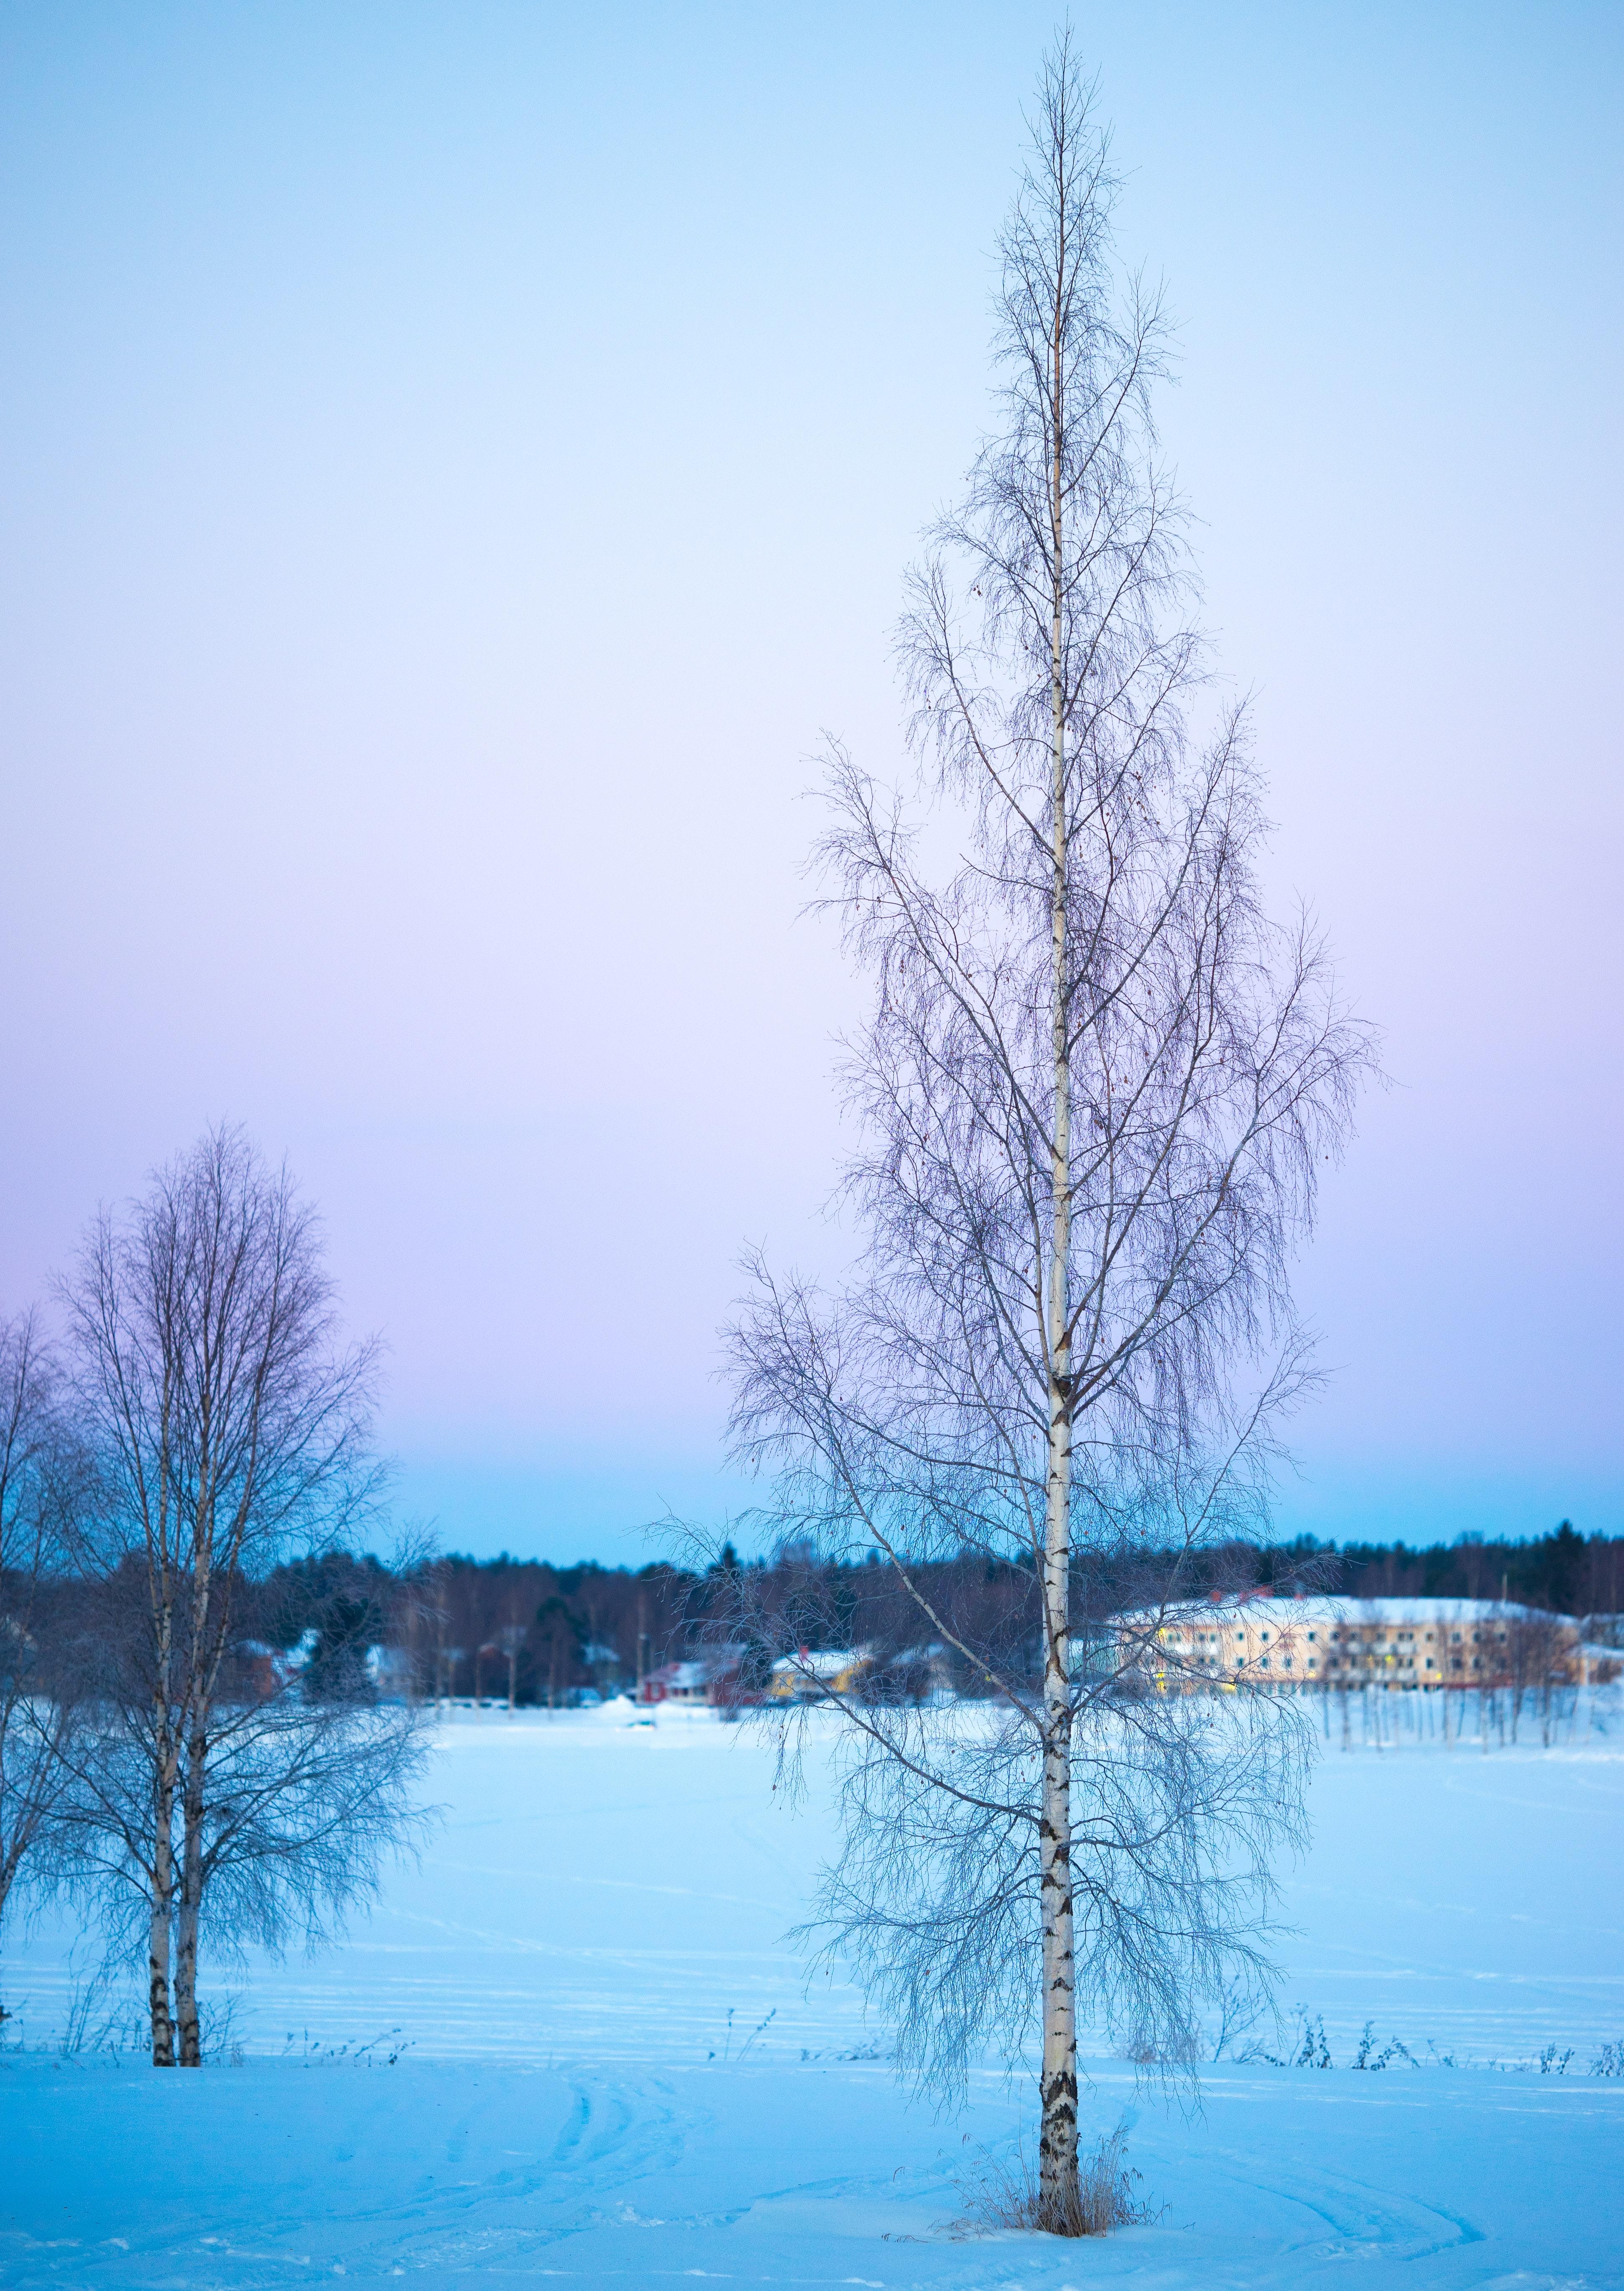 Trees under blue sky photo